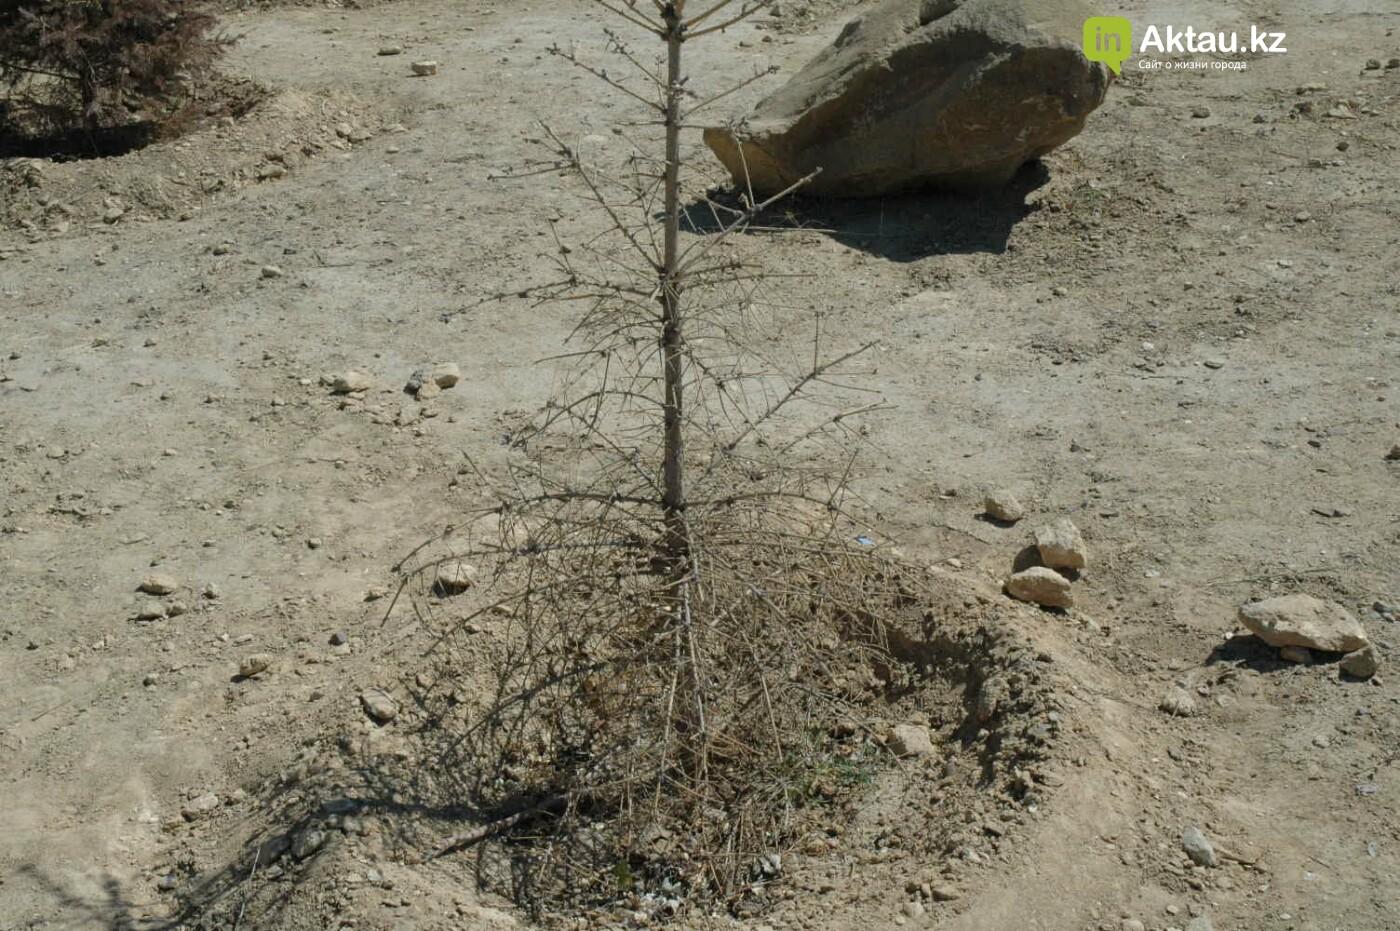 Погибшие от засухи и обезвоживания в Актау исчисляются десятками (ФОТО), фото-4